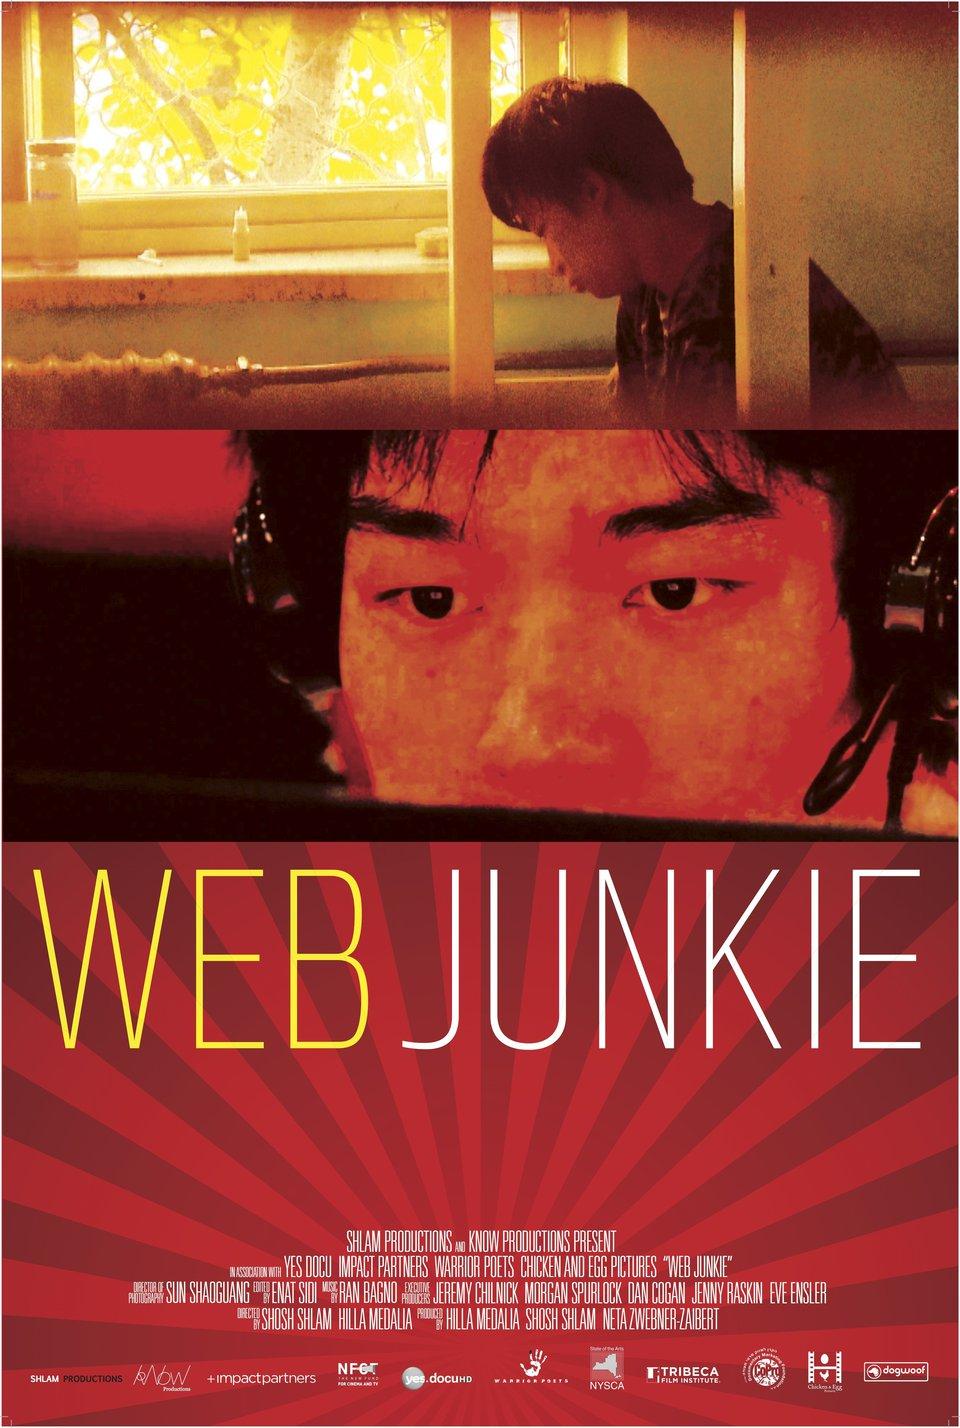 Смотреть онлайн mrs junkie 12 фотография